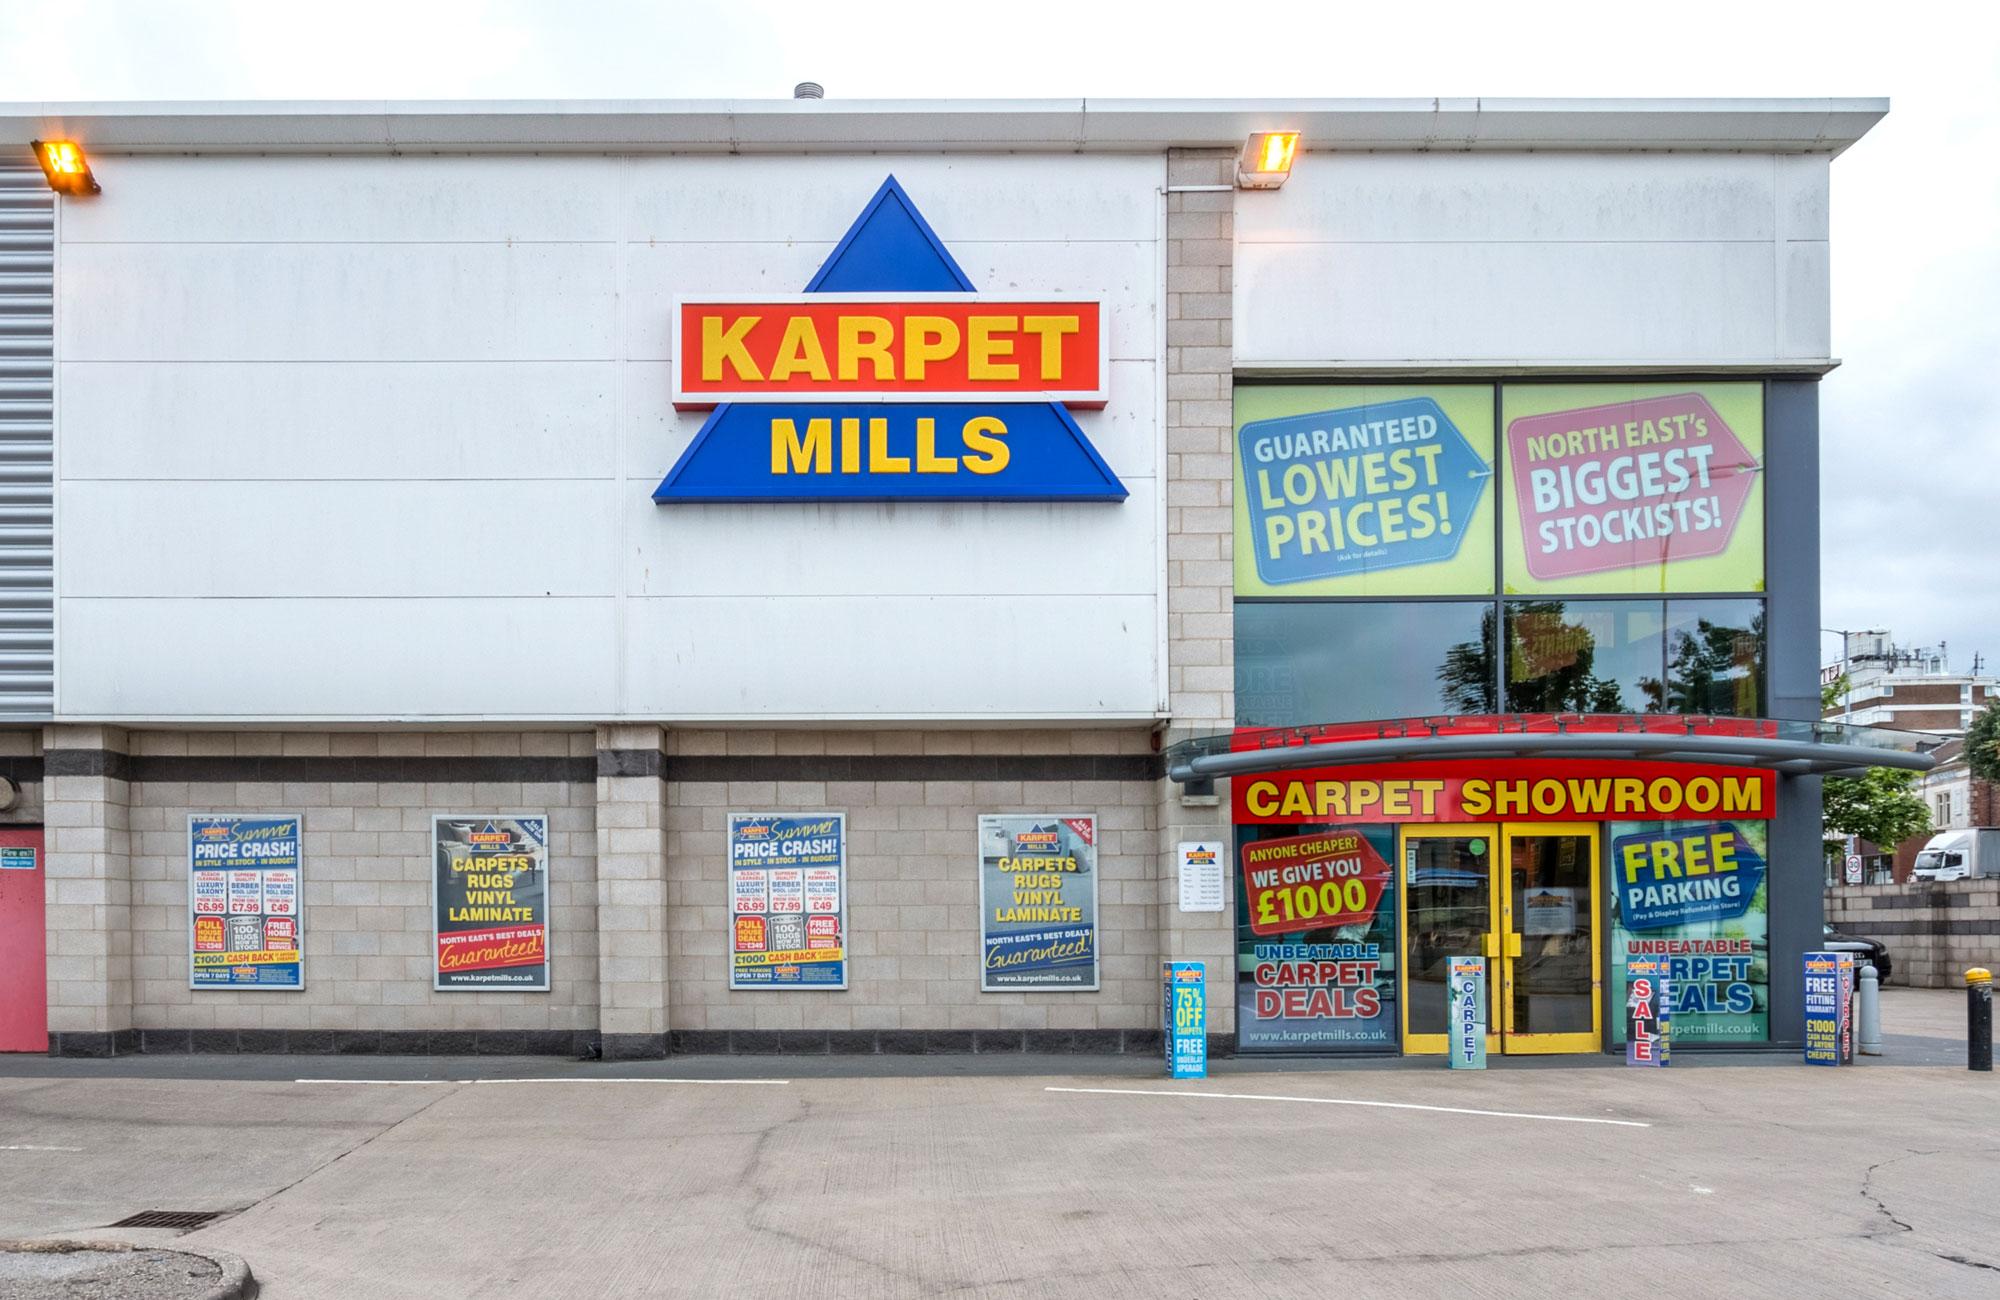 Gateshead Karpet Mills